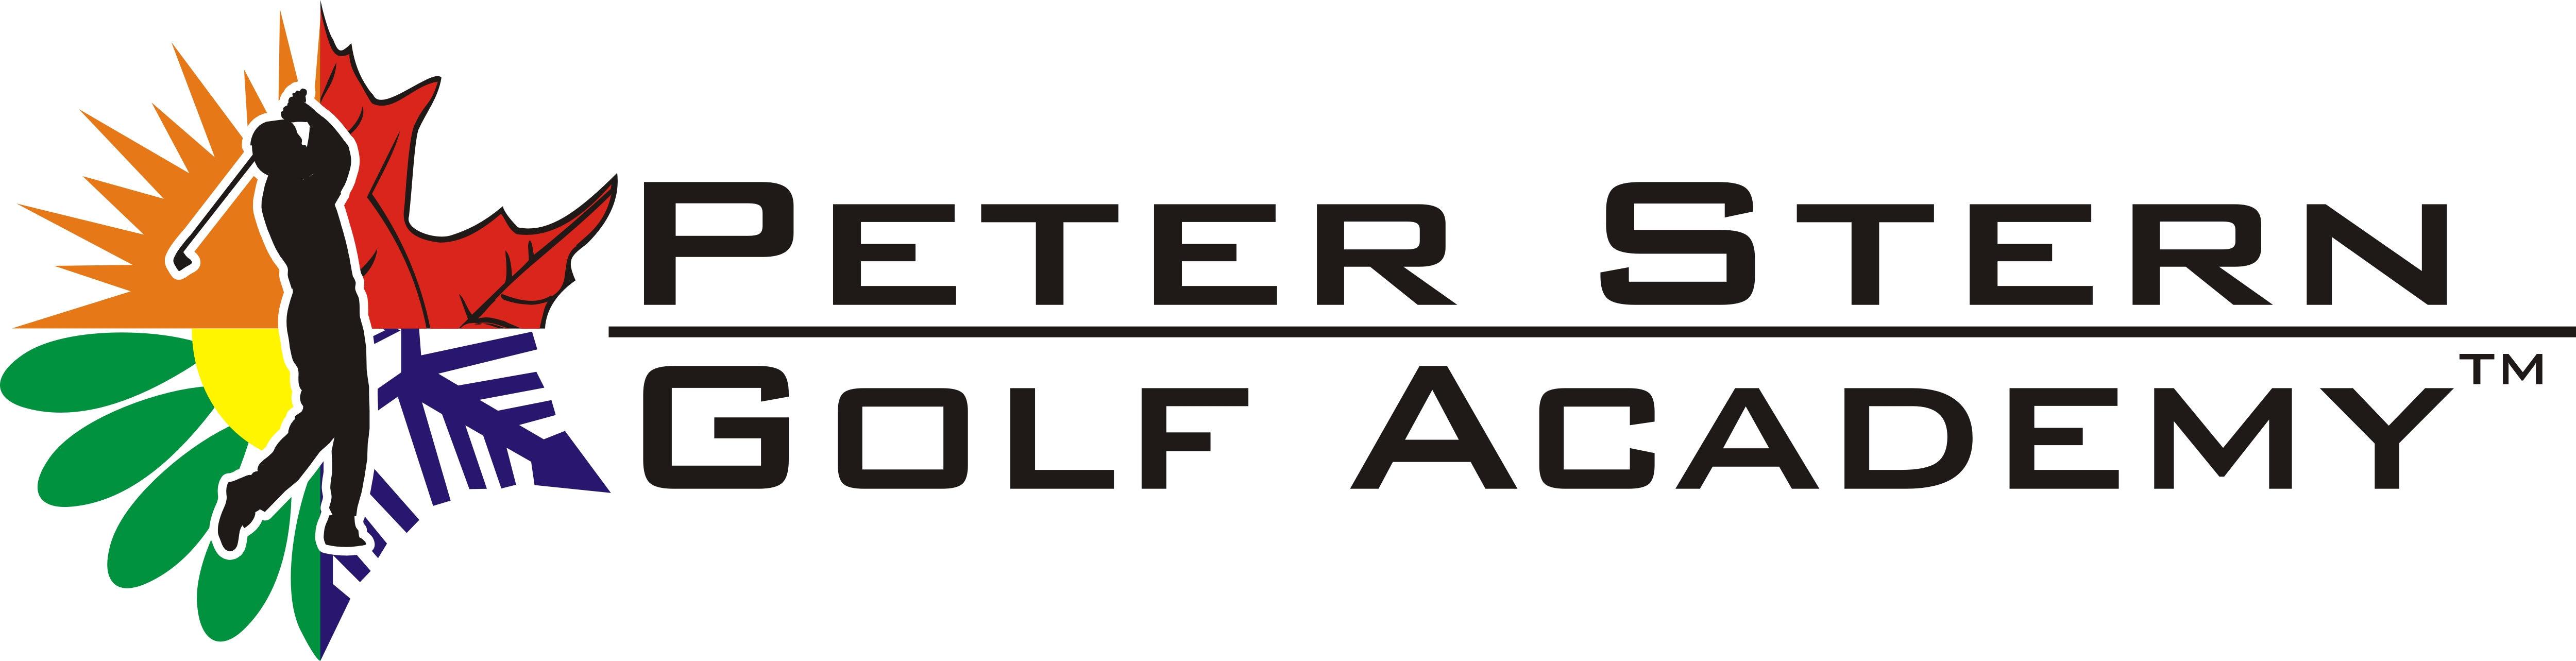 Peter Stern Golf Academy – Golf Channel Academy – New York